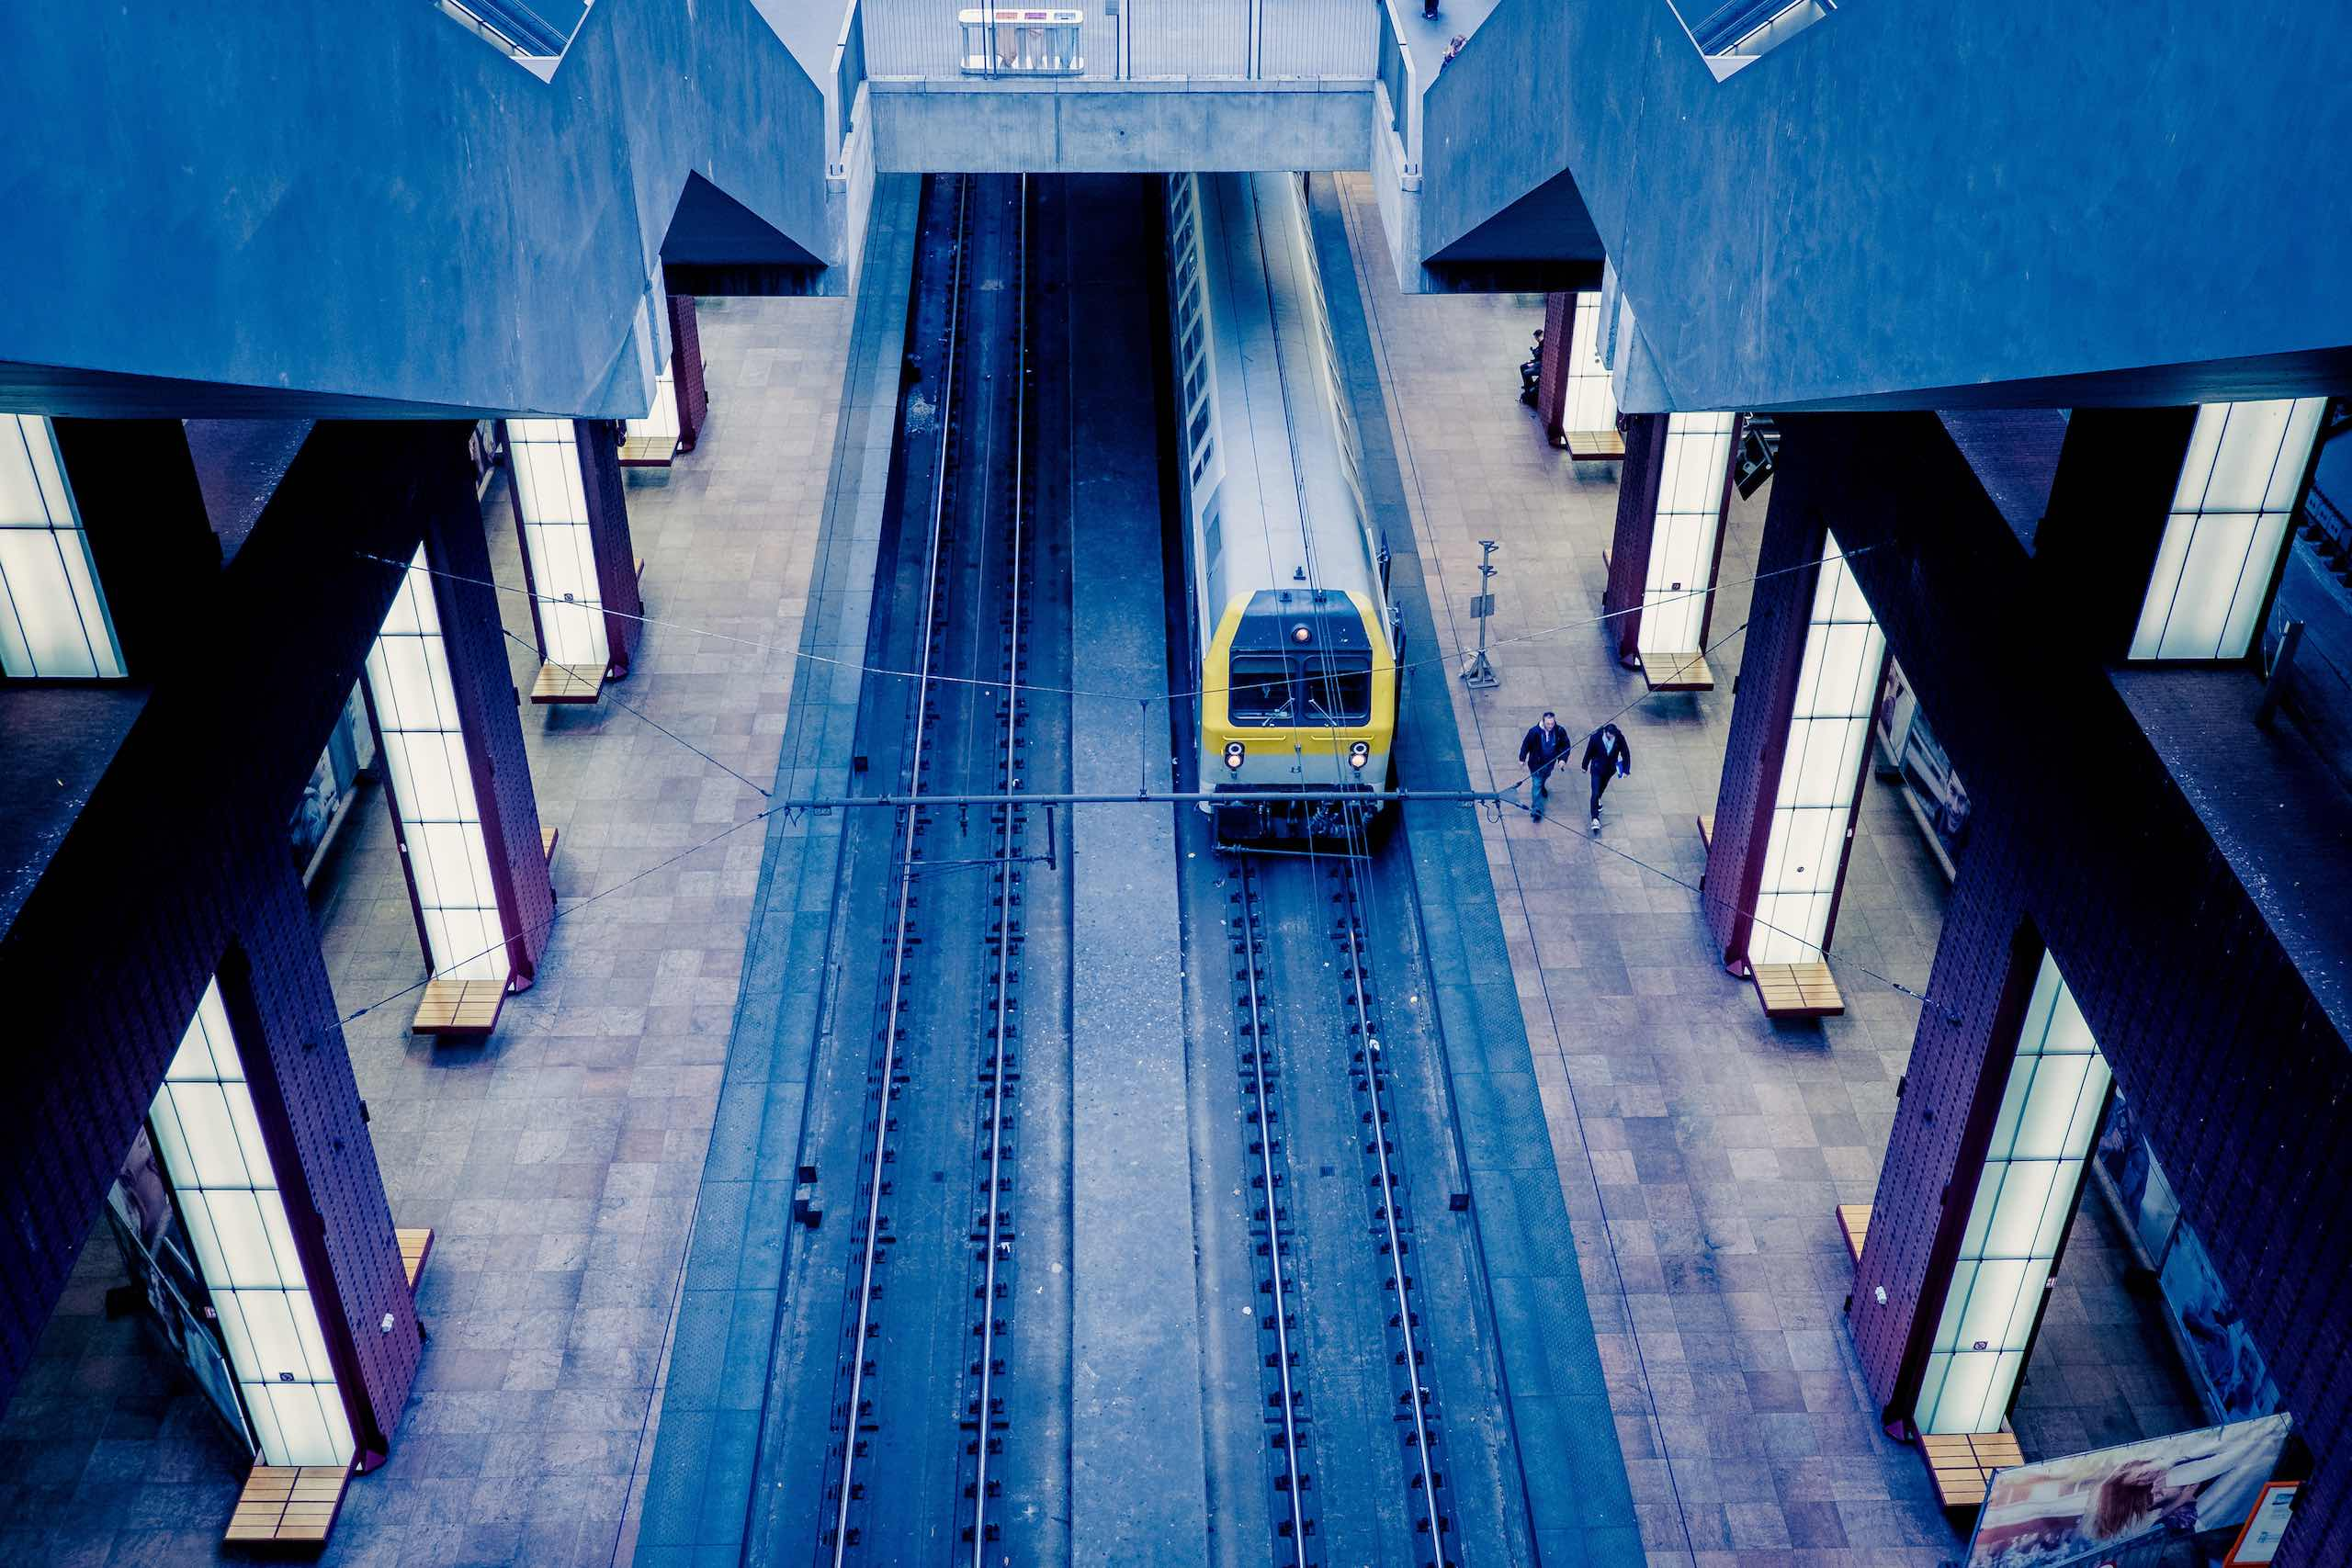 Antwerpen-Centraal | Photo: Ludwig Wallendorff